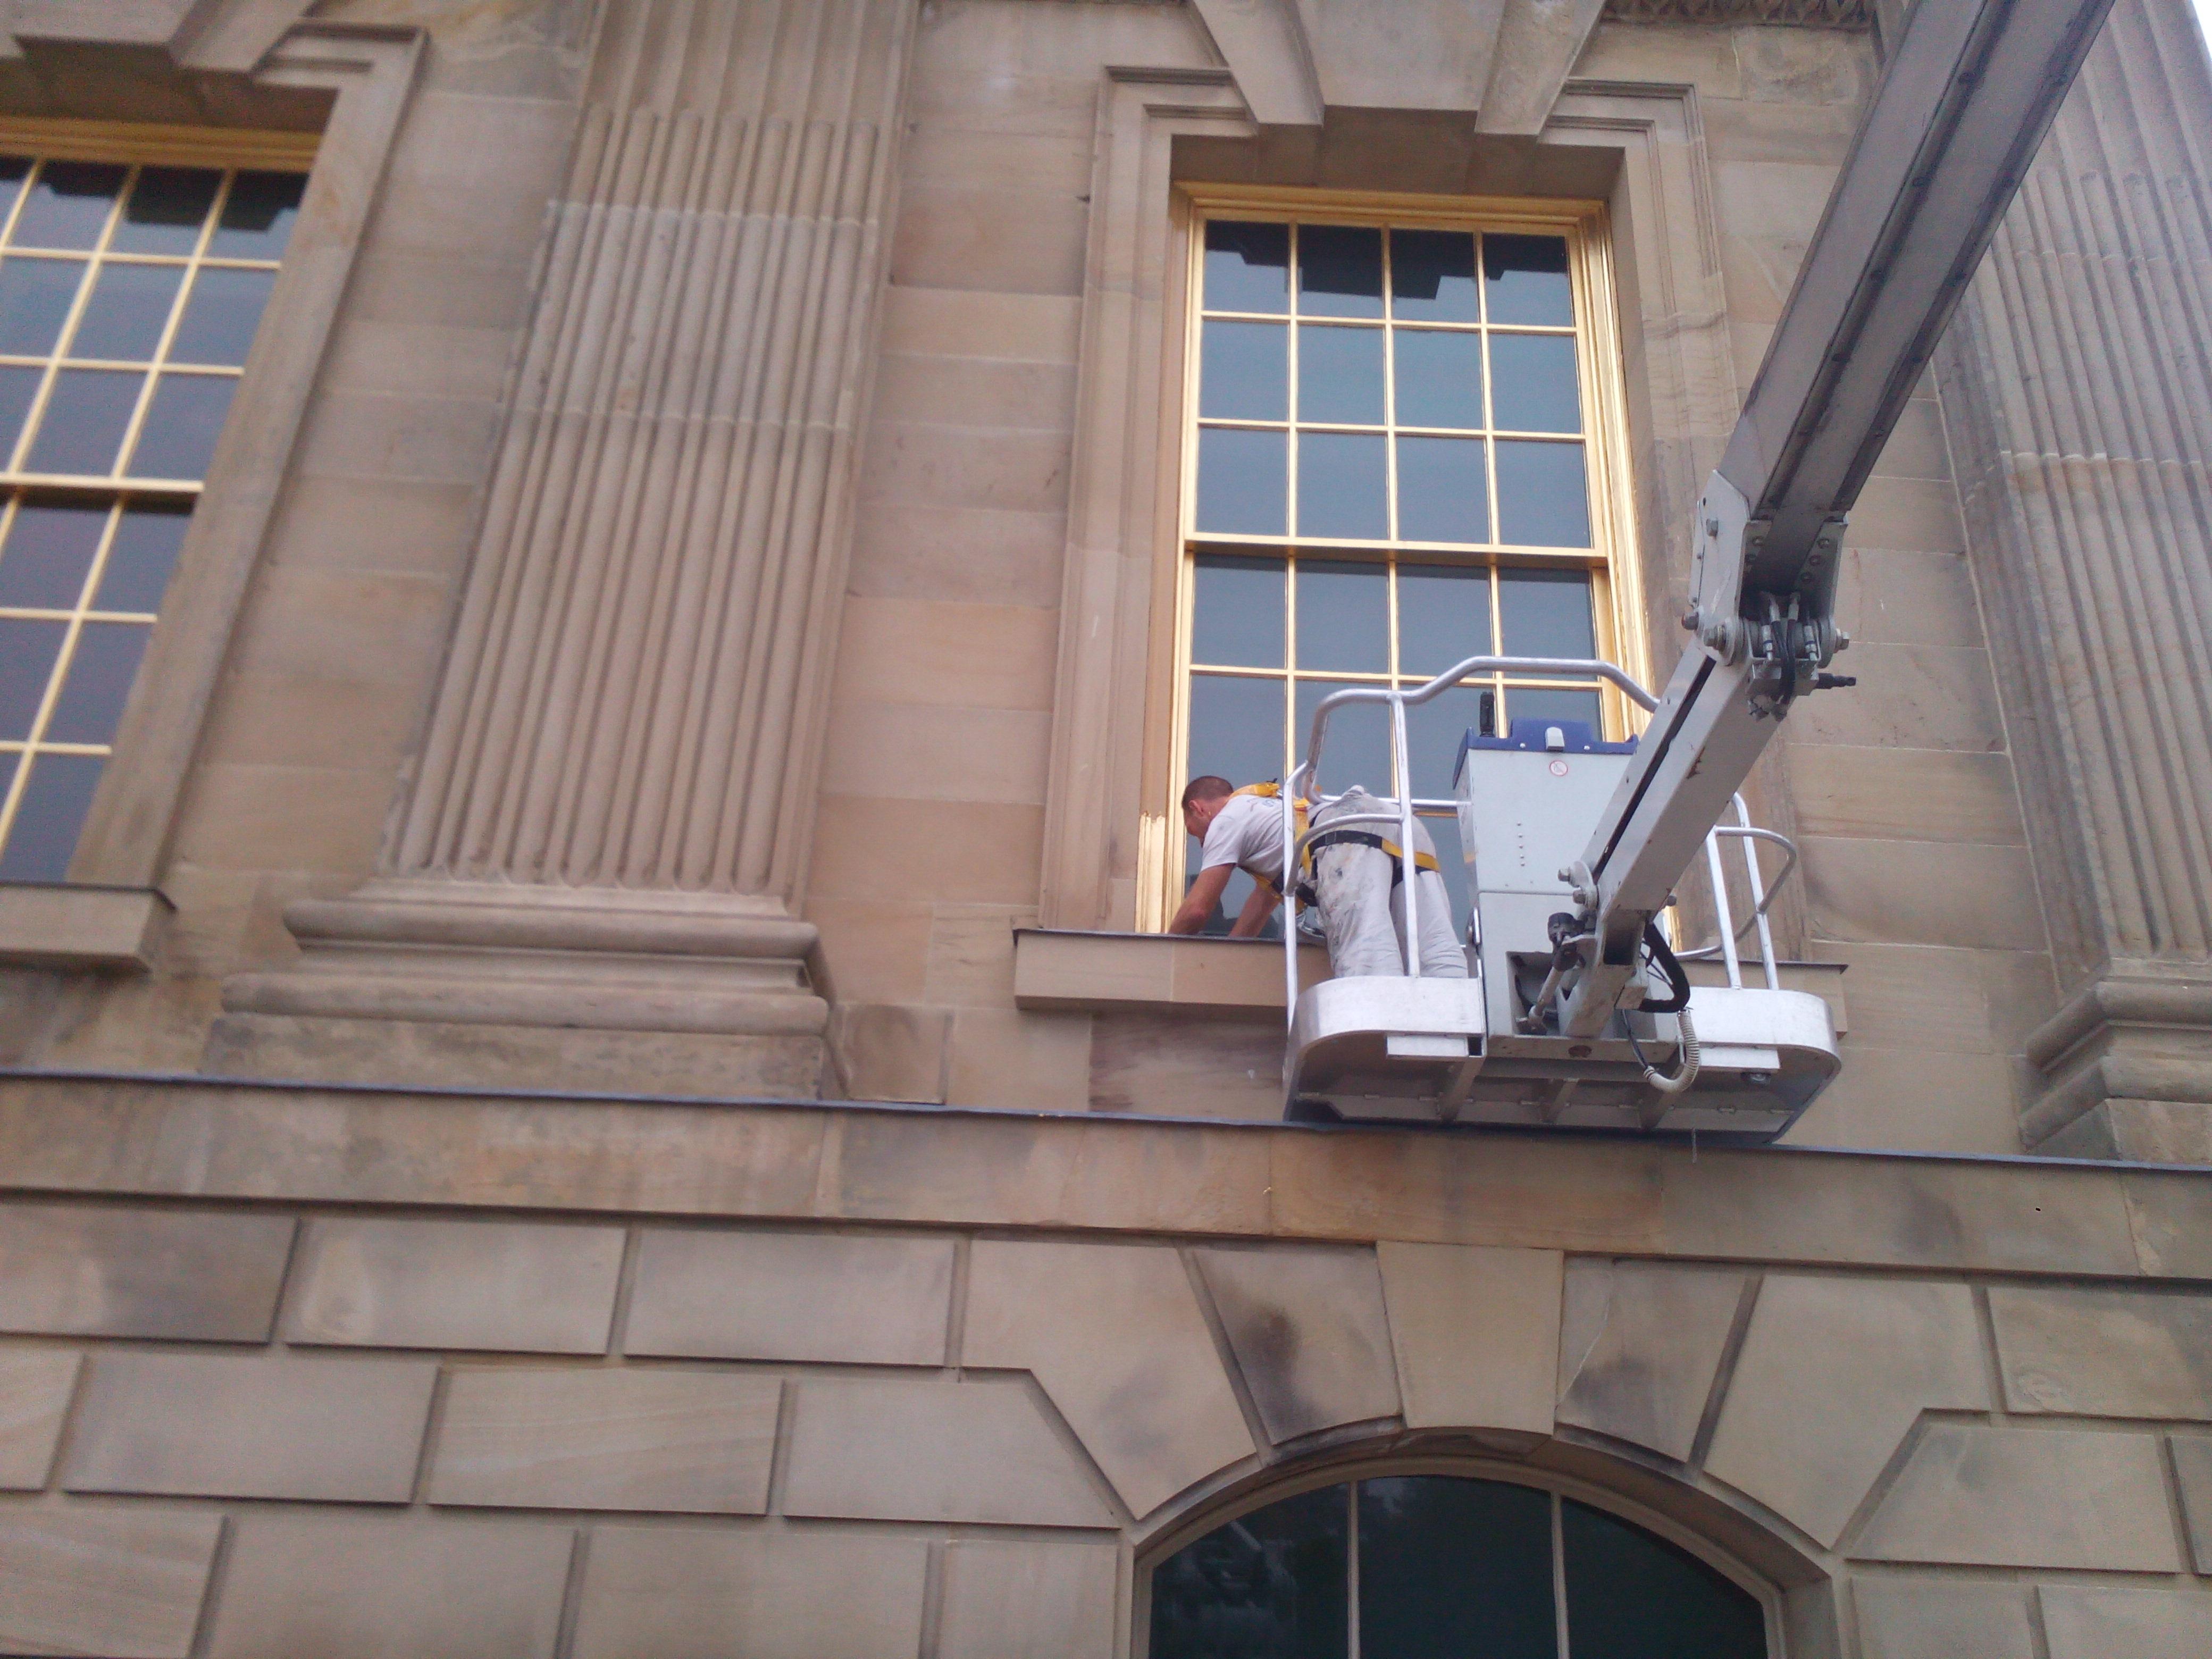 #GoldGilding the last of the 42 windows!